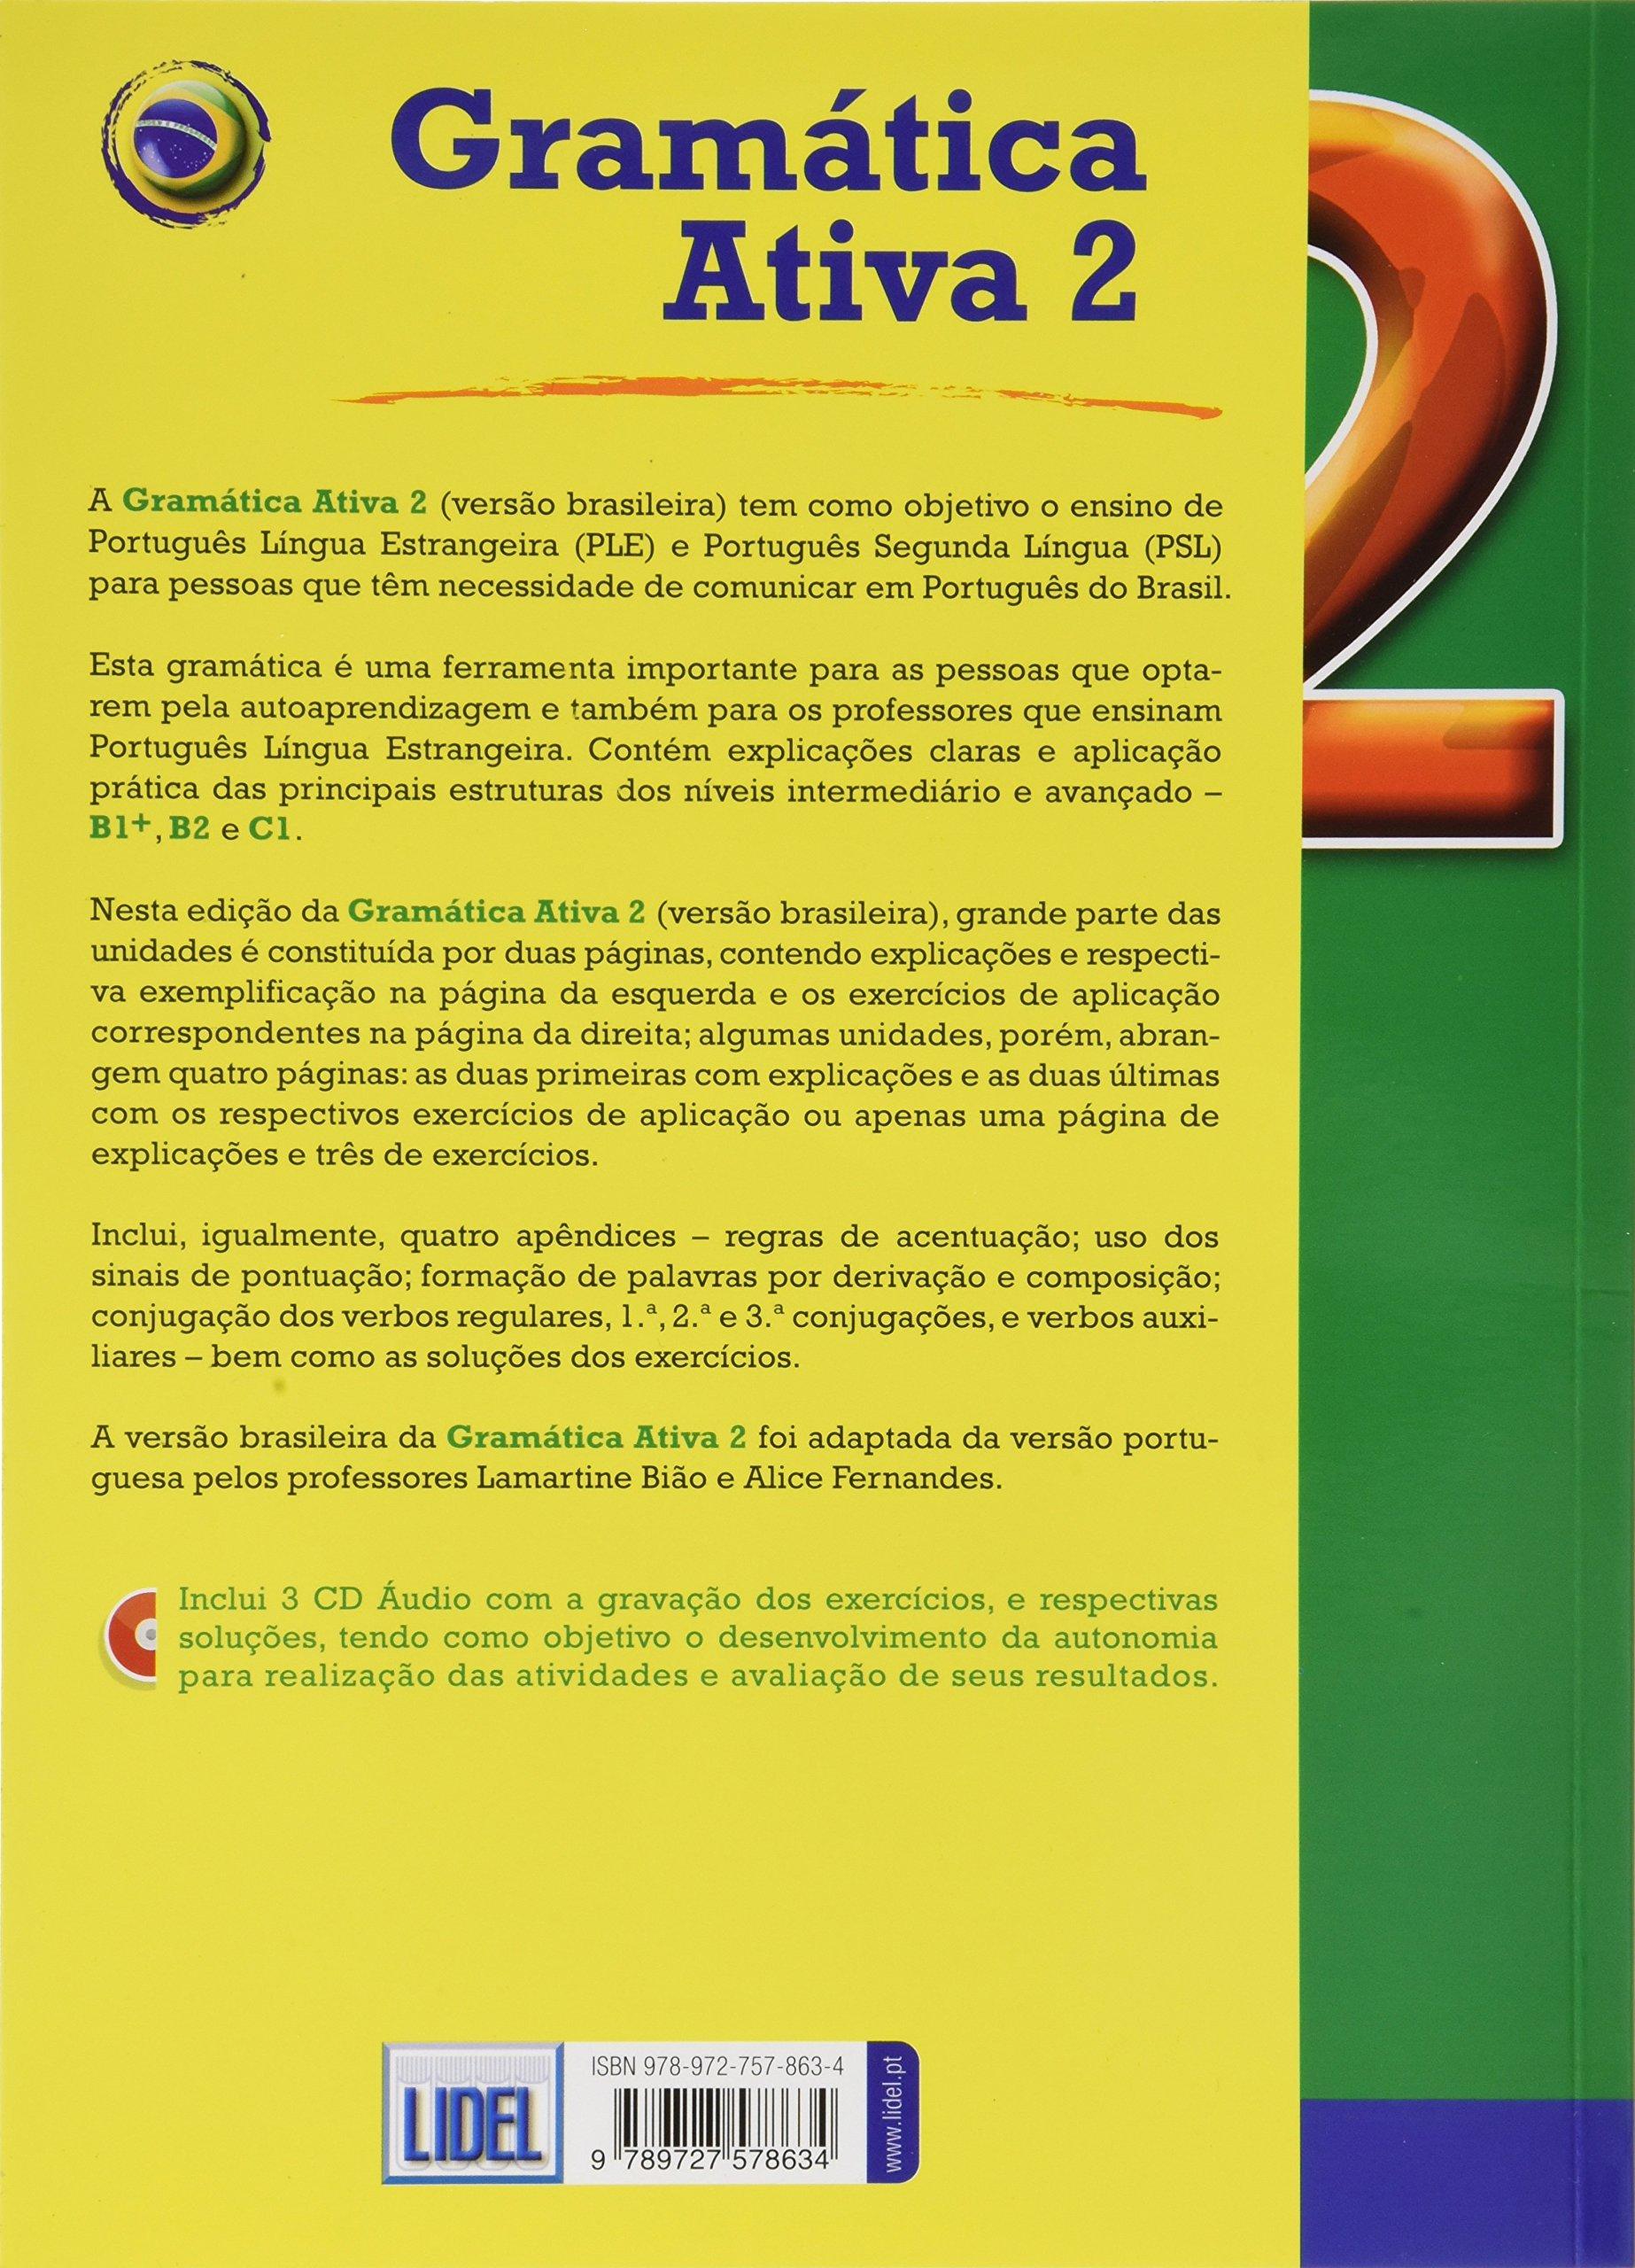 Gramatica Ativa - Versao Brasileira: Book 2 (levels B1+, B2 and C1) + CD (3  (Portuguese Edition): Vv.Aa: 9789727578634: Amazon.com: Books